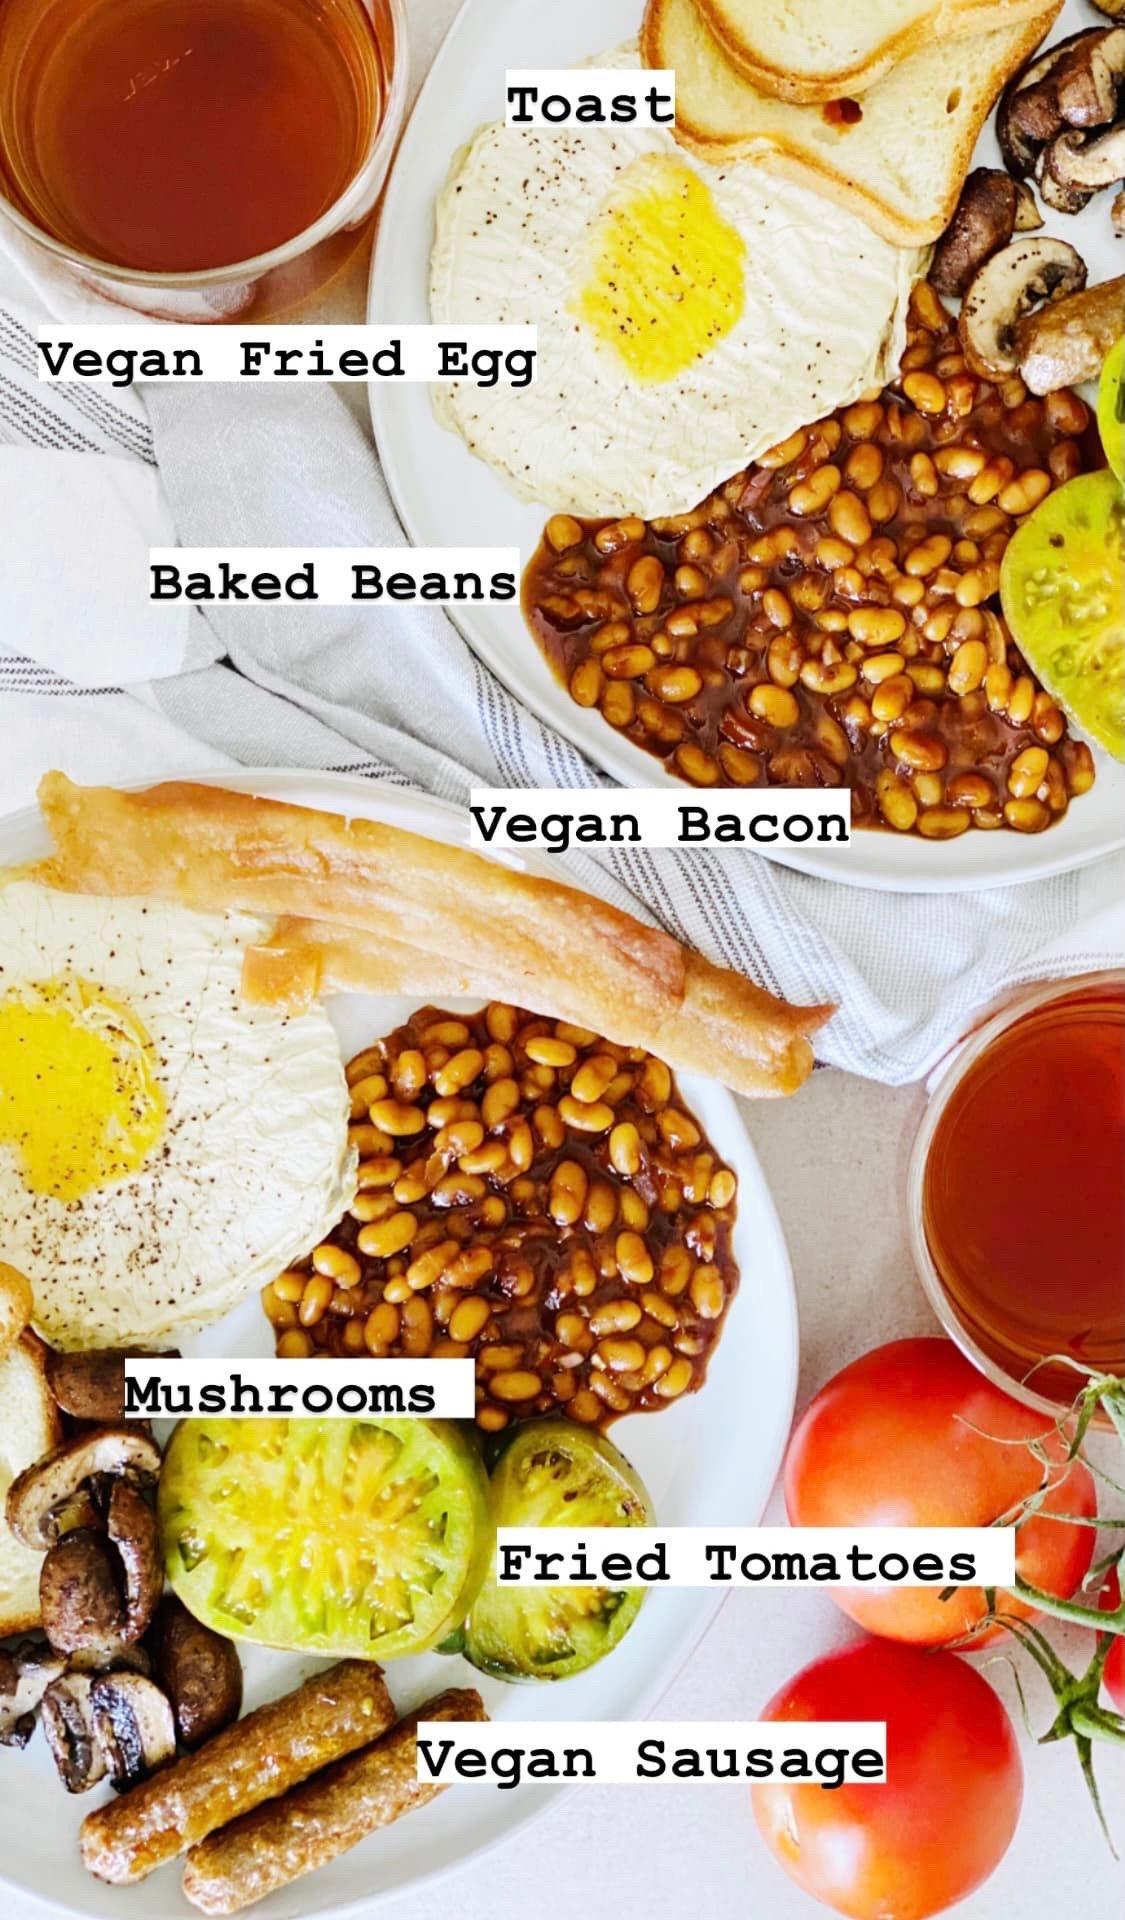 Ingredients For A Proper Vegan Gluten-Free English Breakfast